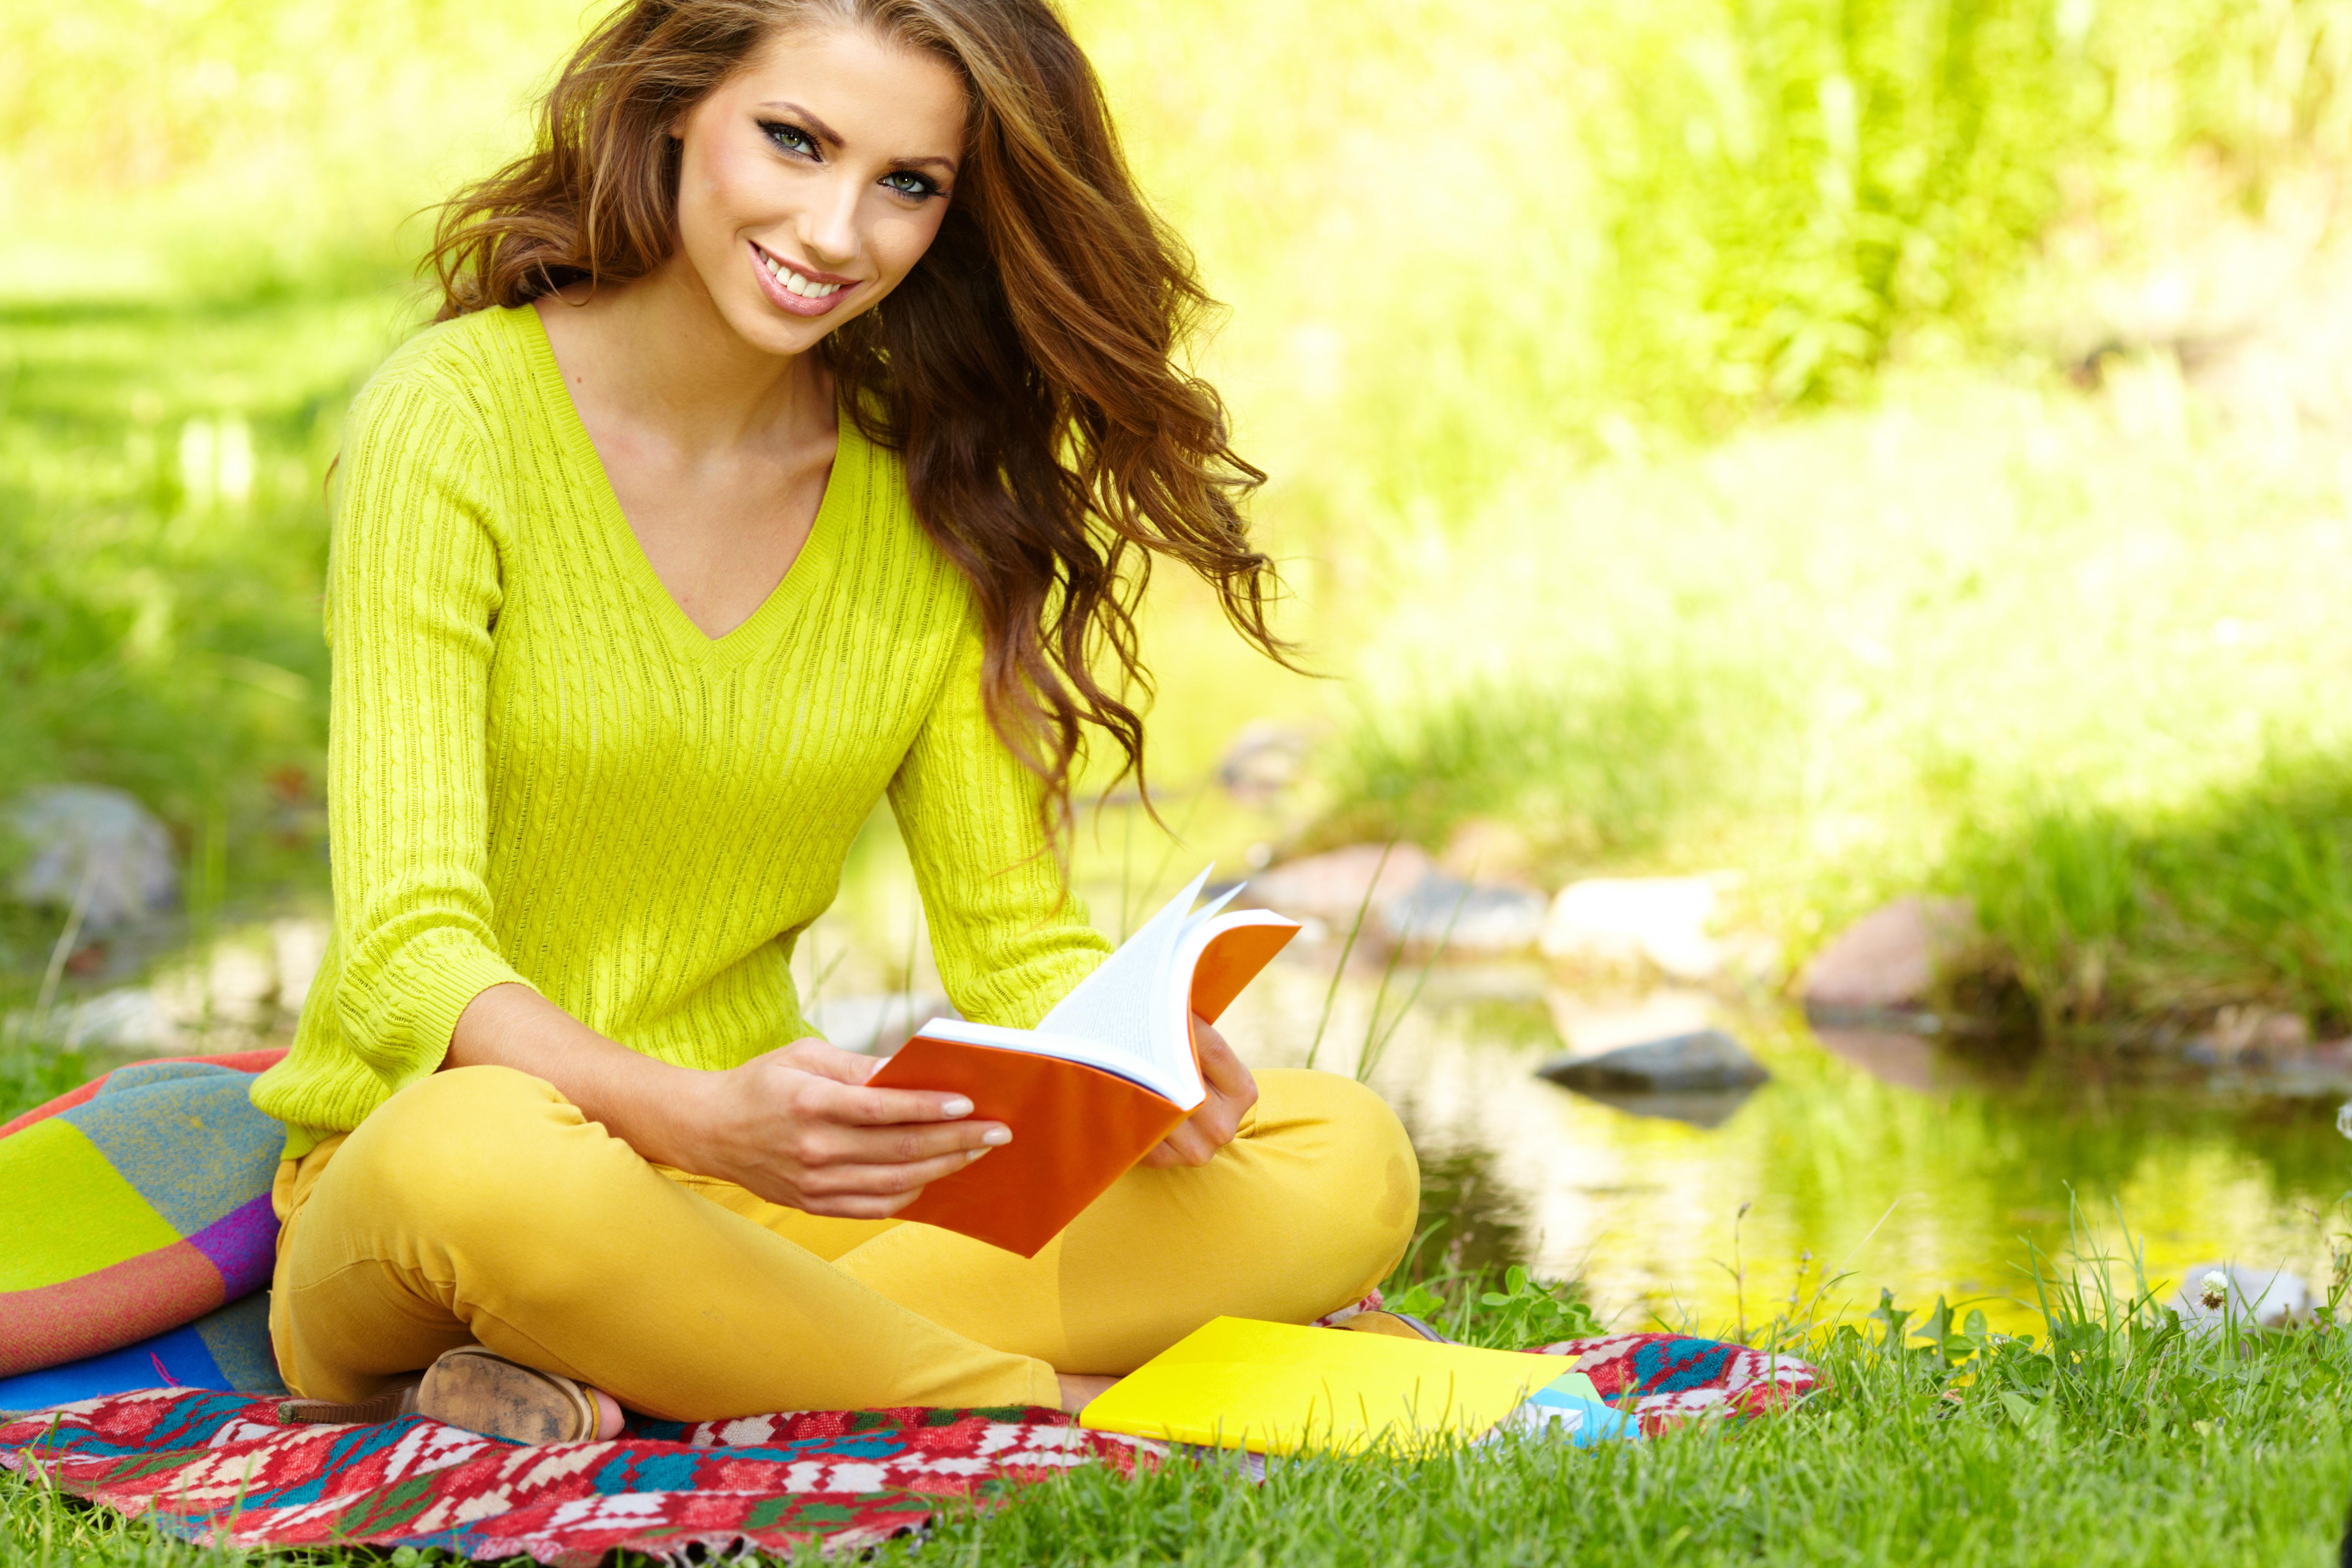 Девушка с книгой на траве бесплатно